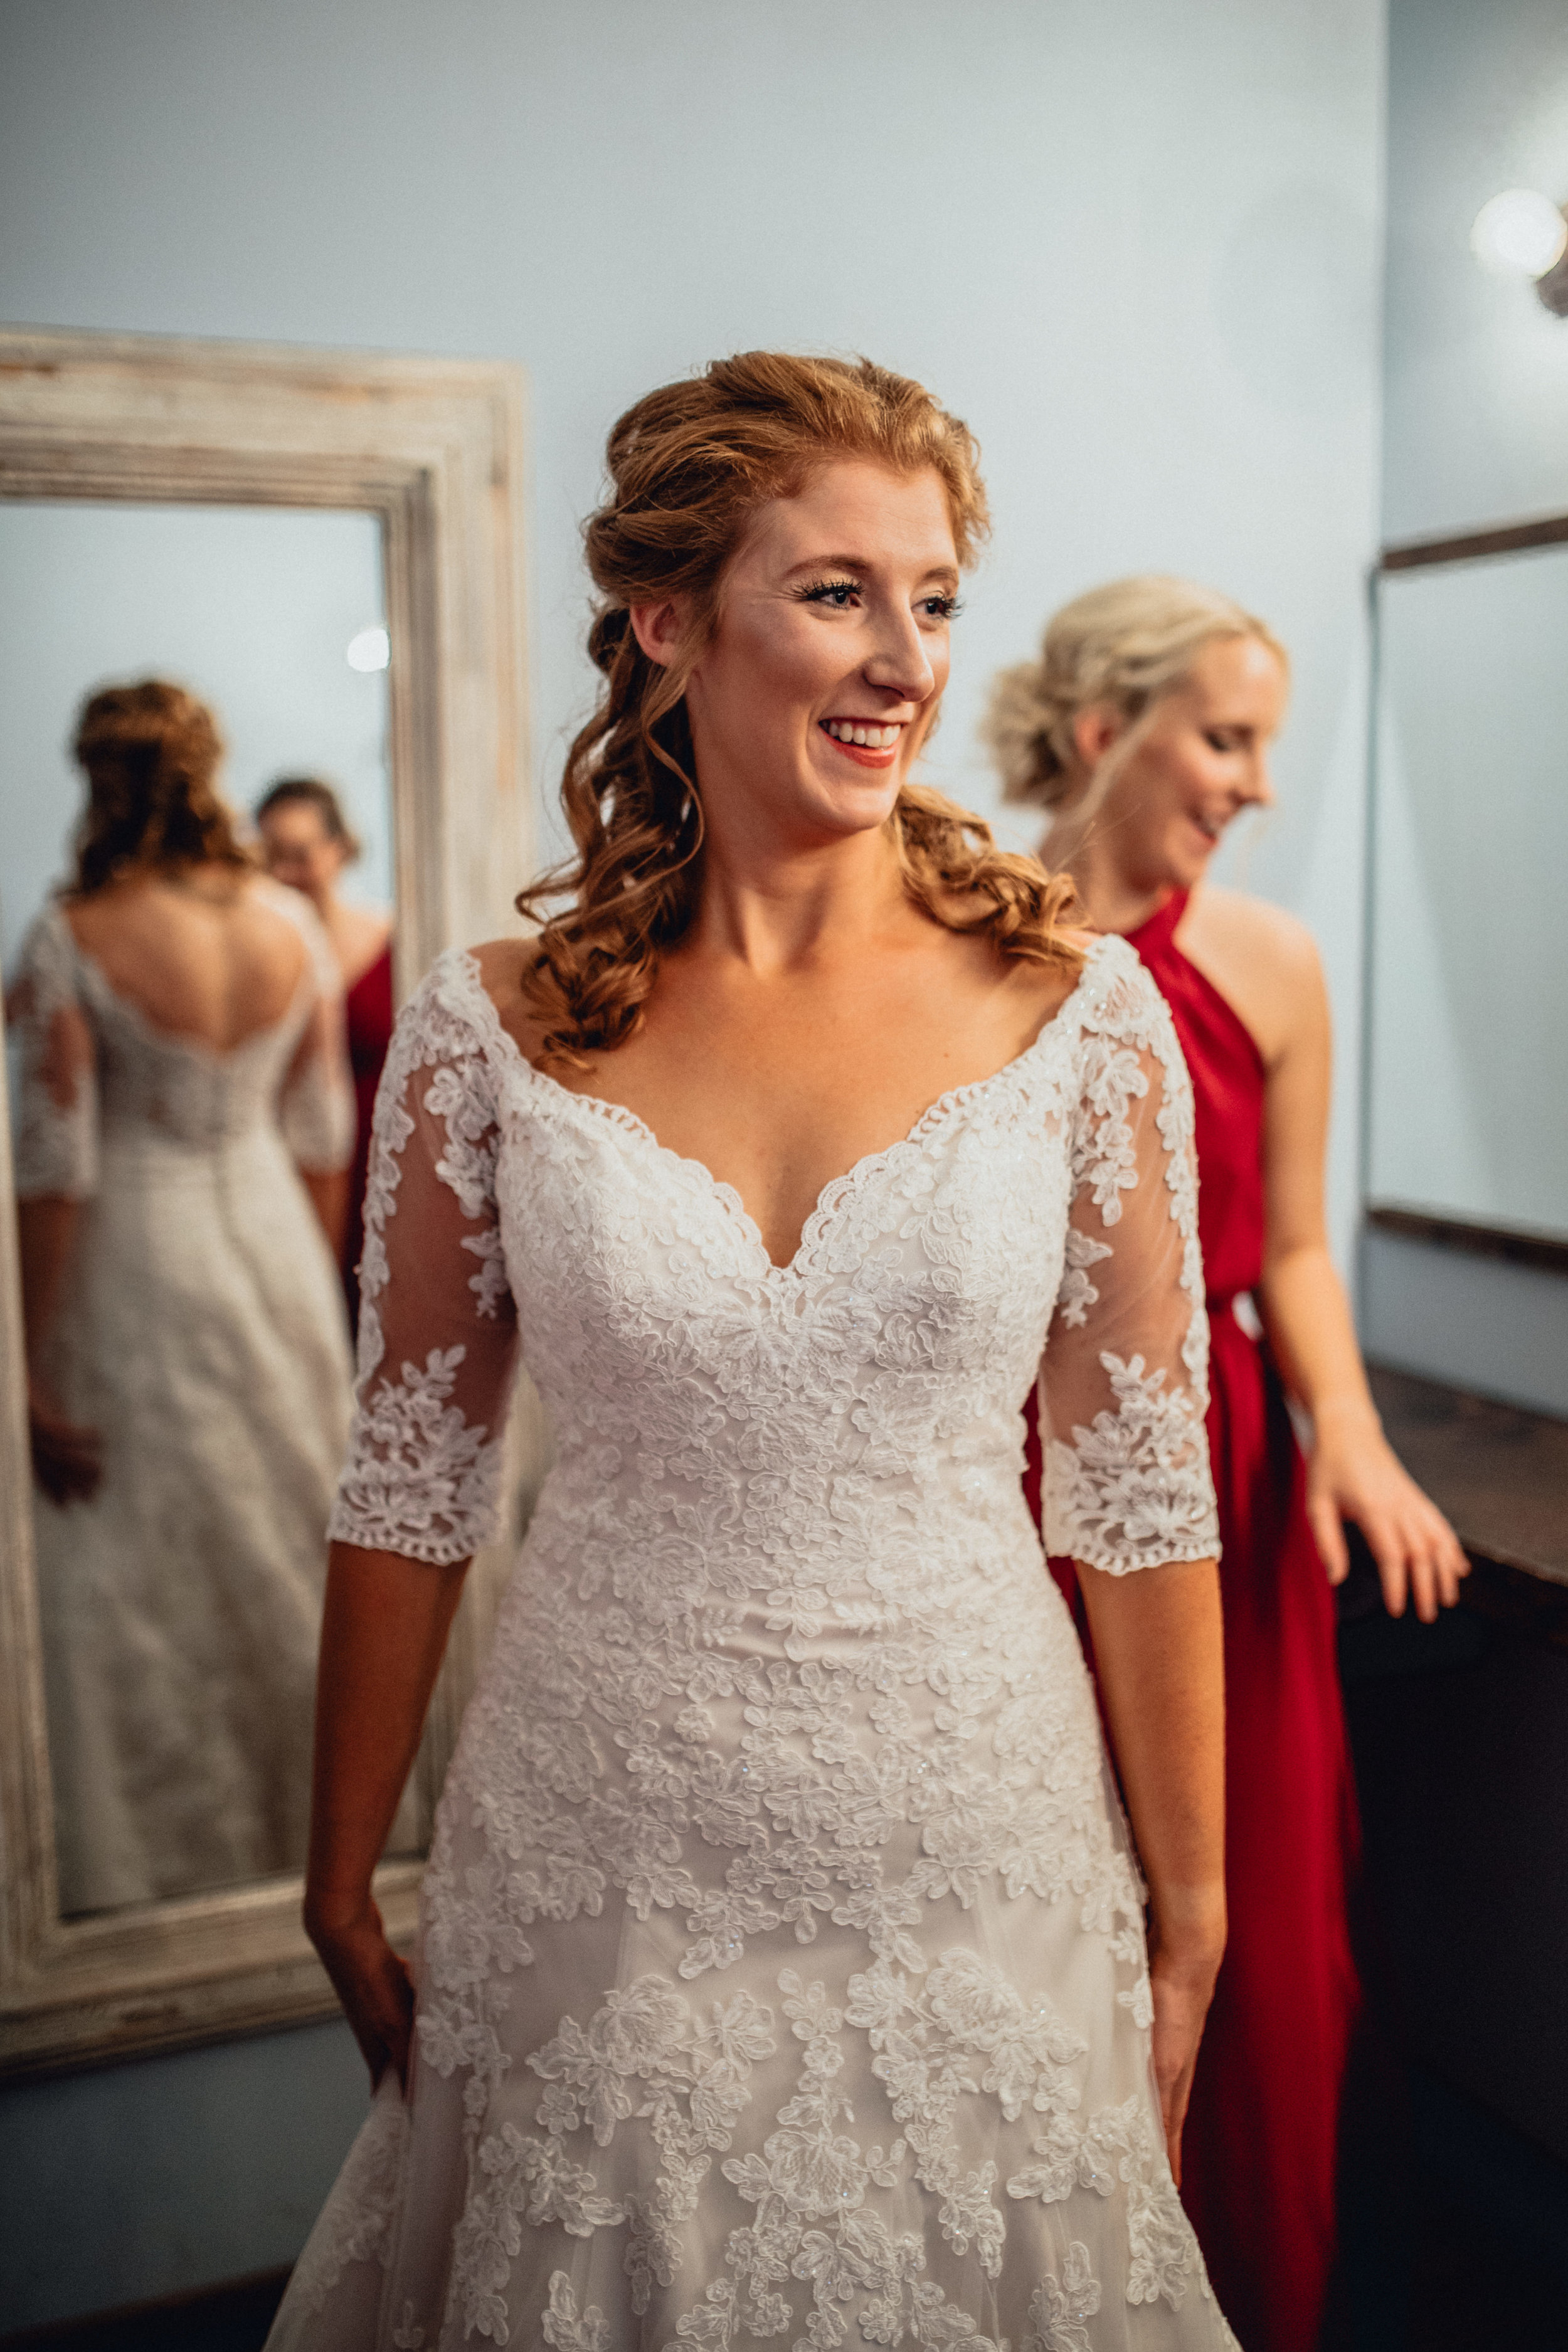 bride-smiling-in-dress.jpg